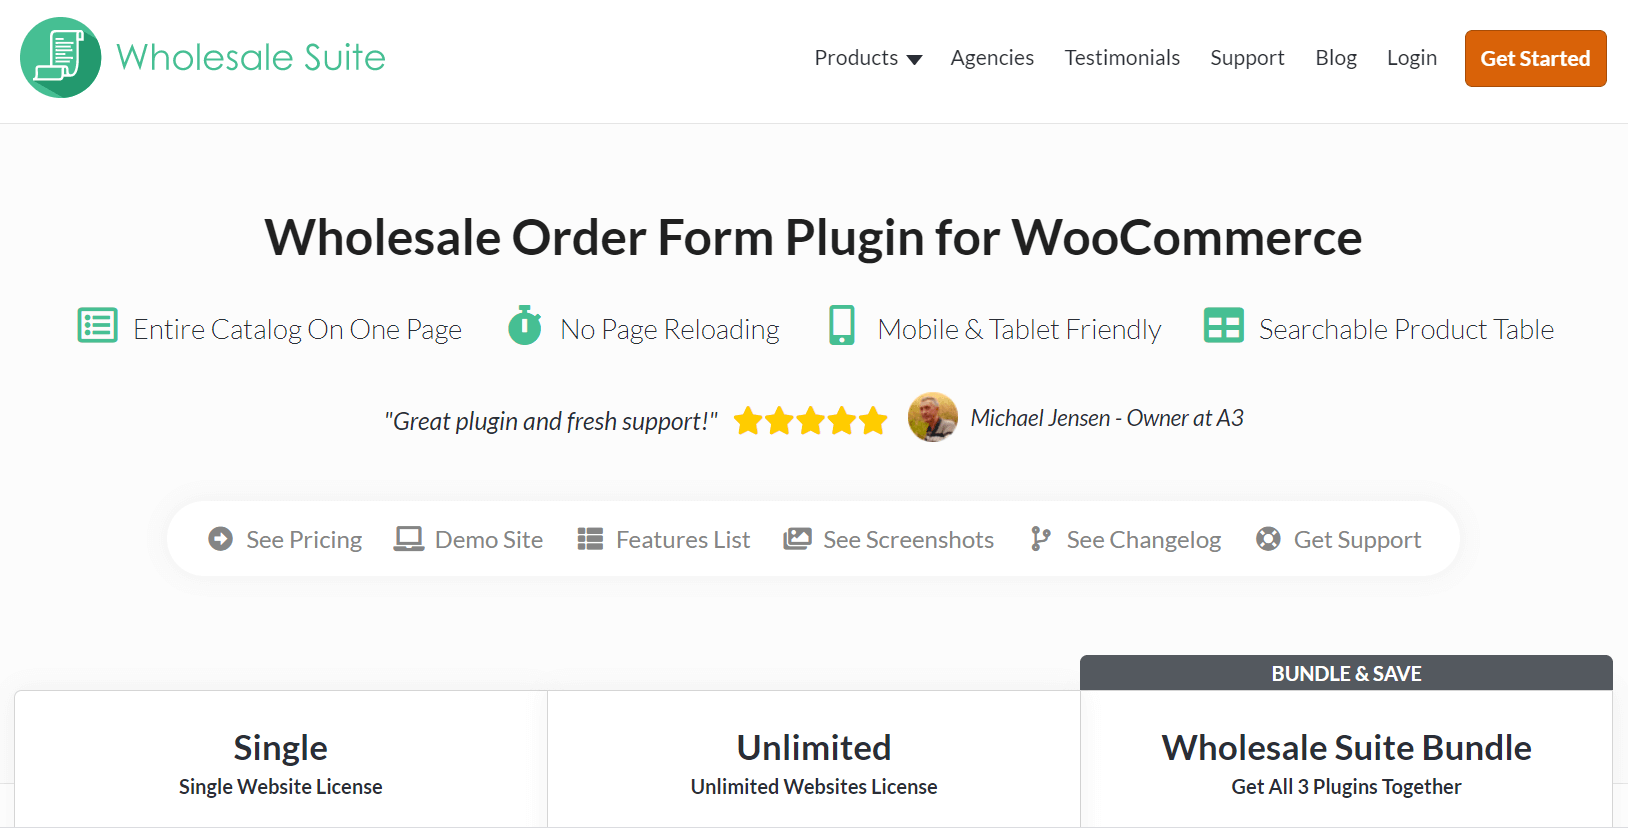 Wholesale Suite Order Form plugin homepage